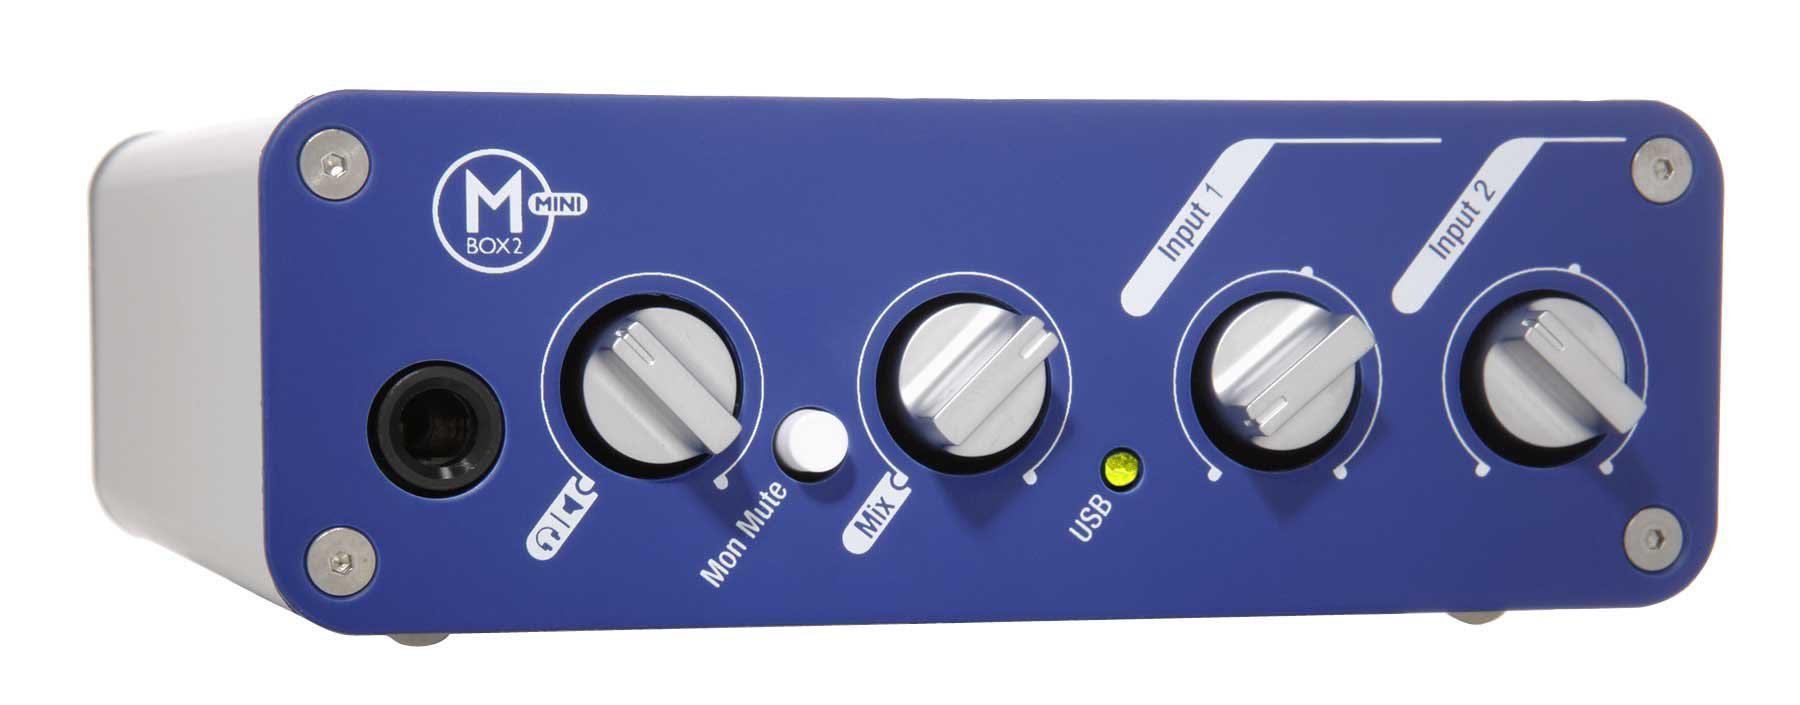 USB lydkort fra Digdesign